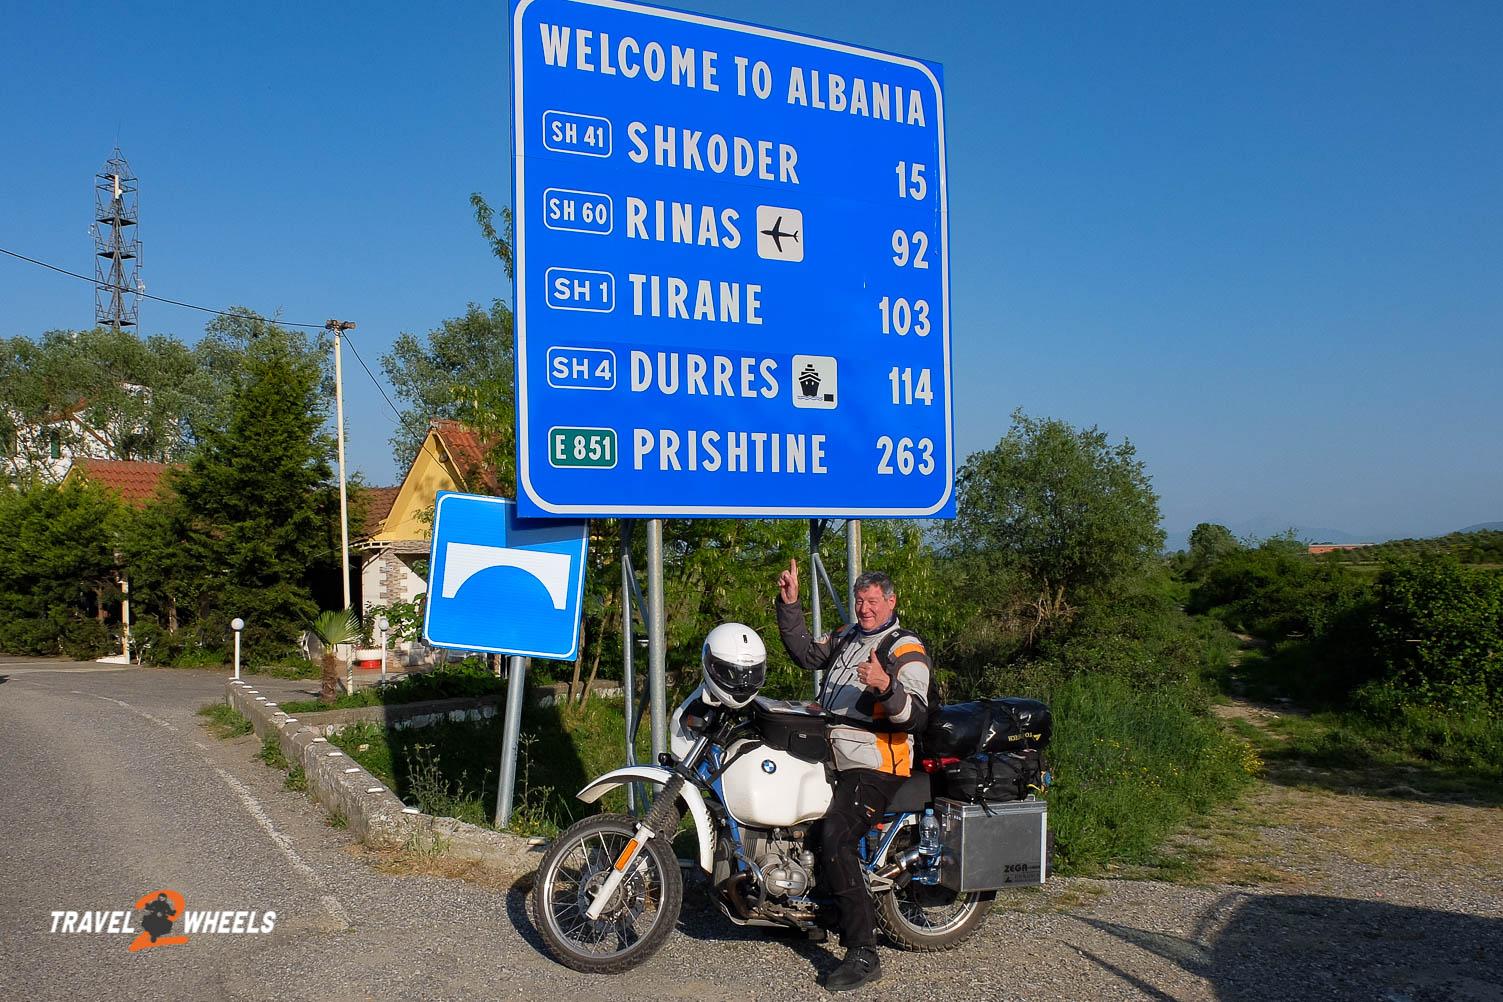 nepal2018 welcome to albania Albanien